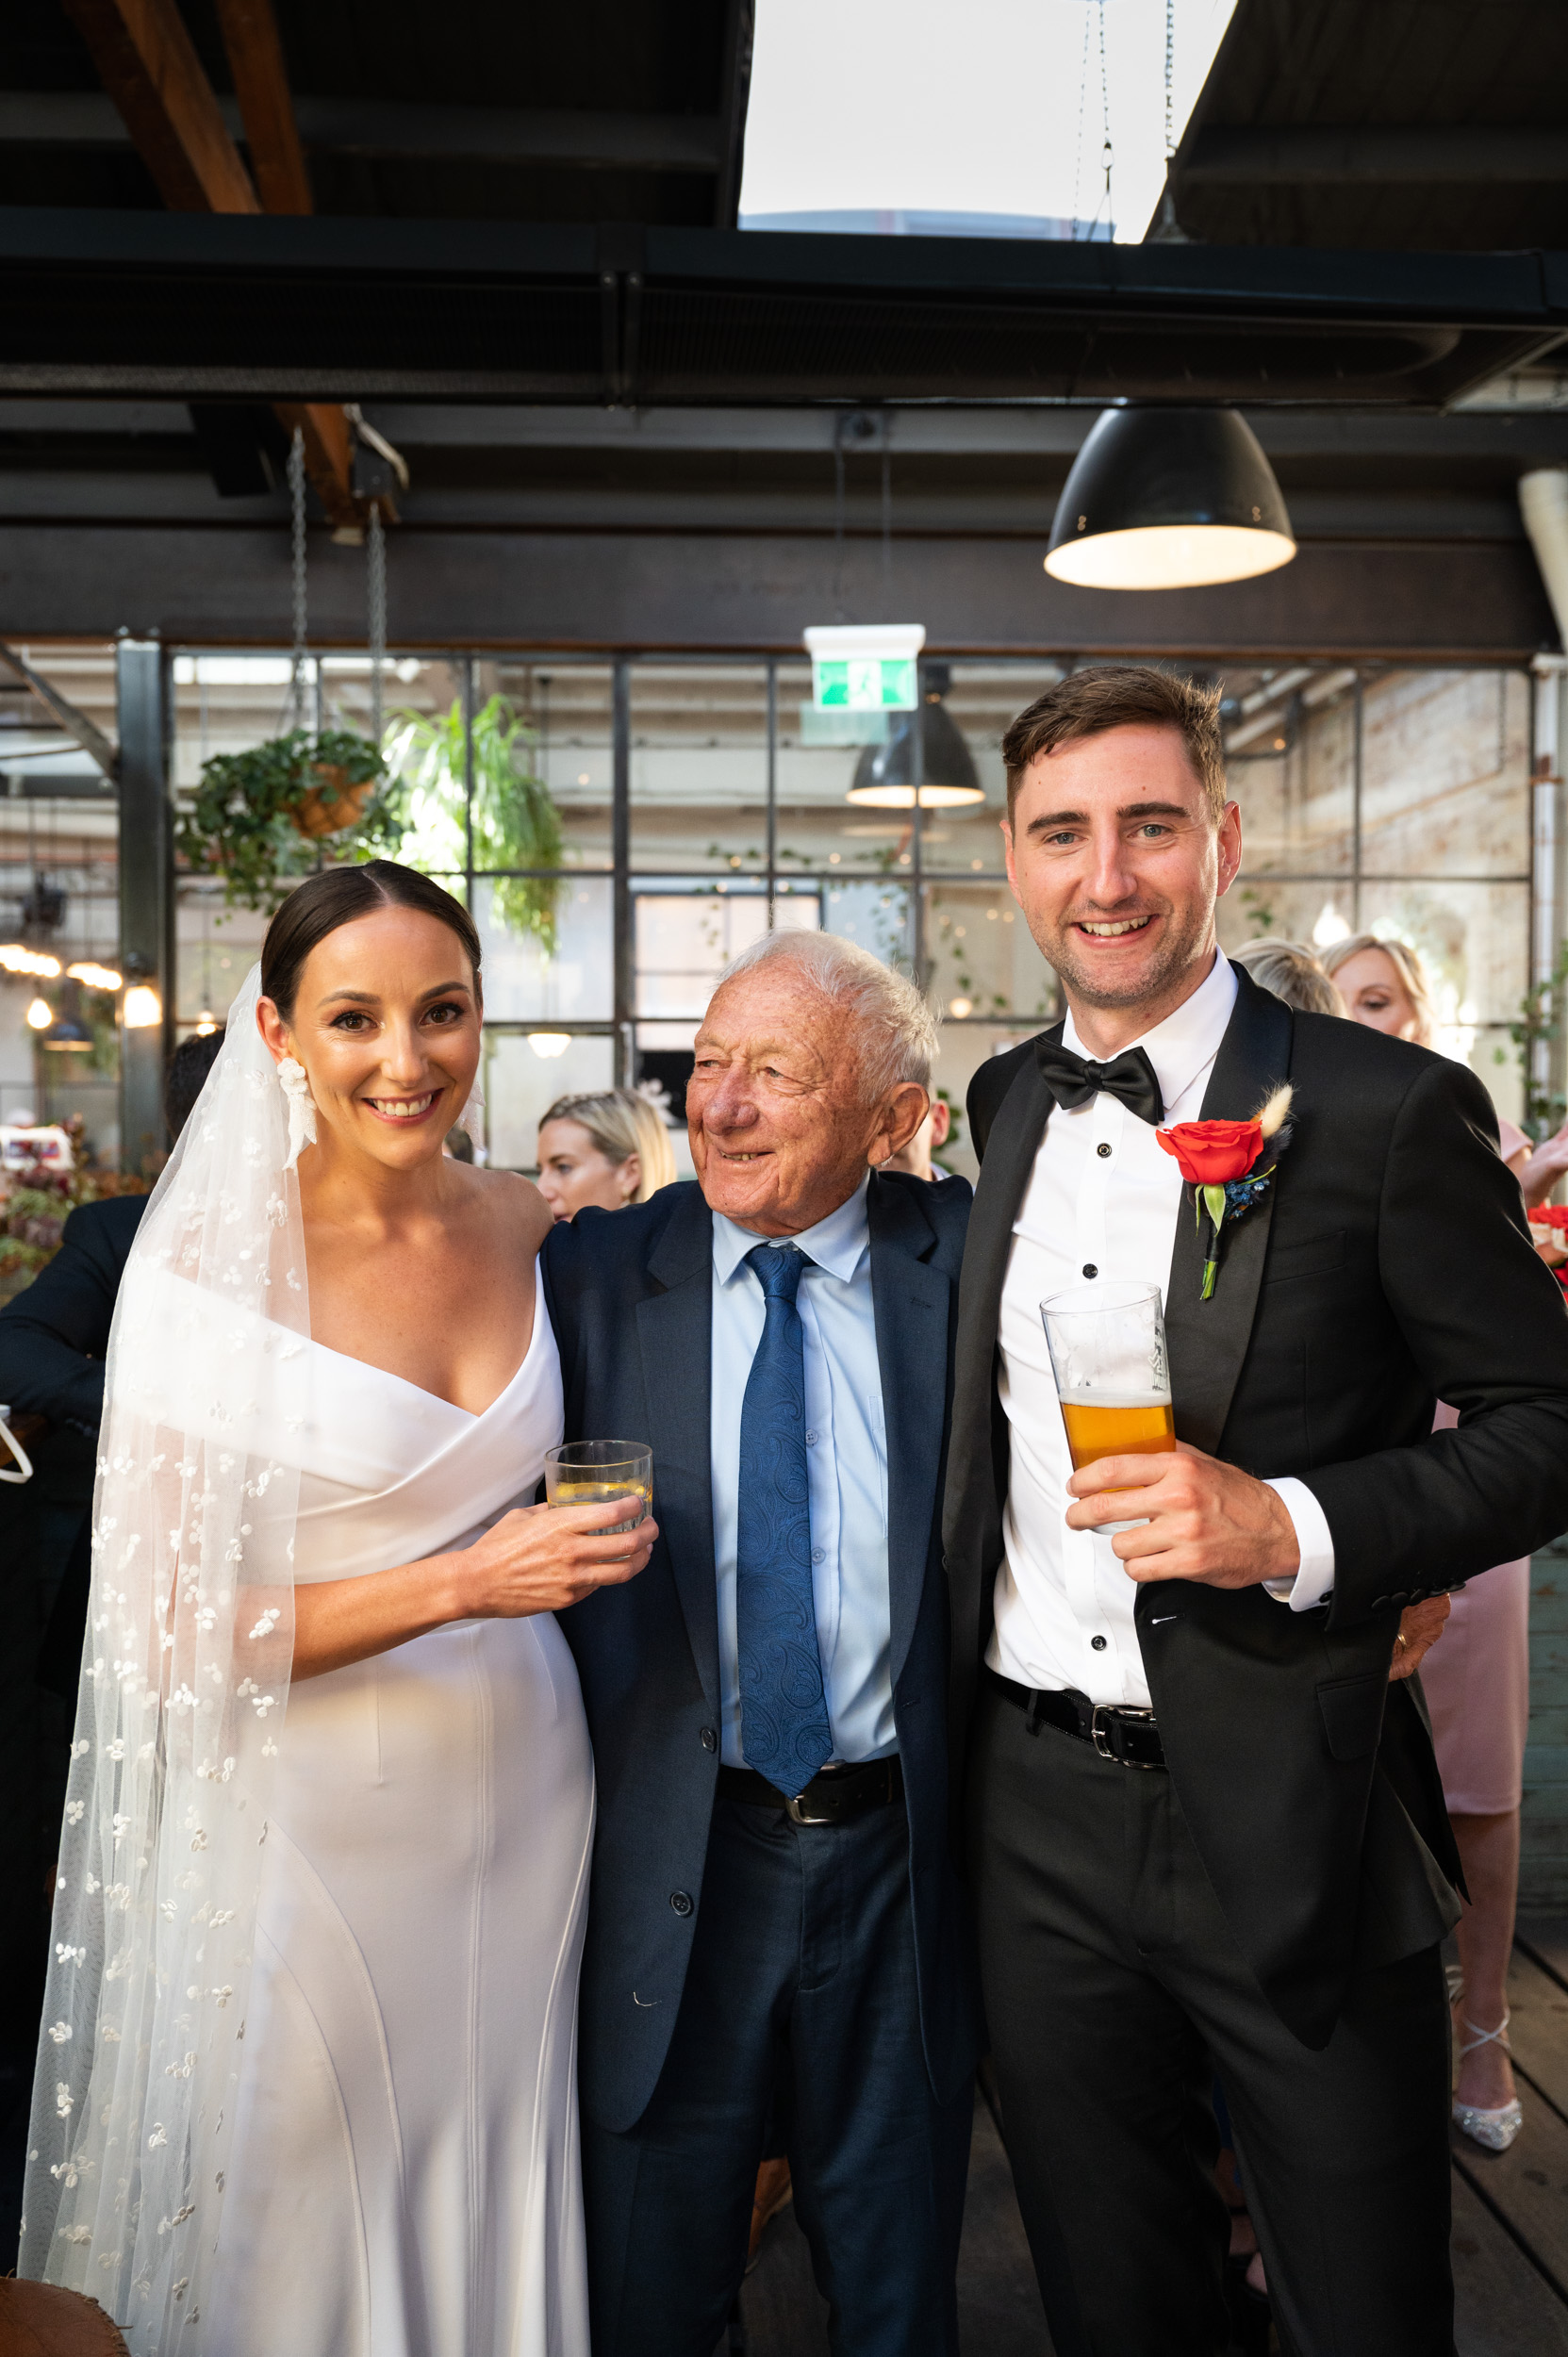 Wedding, Wedding Day, Father & Bride, Wedding Ceremony, Emotion, Butler Lane Richmond